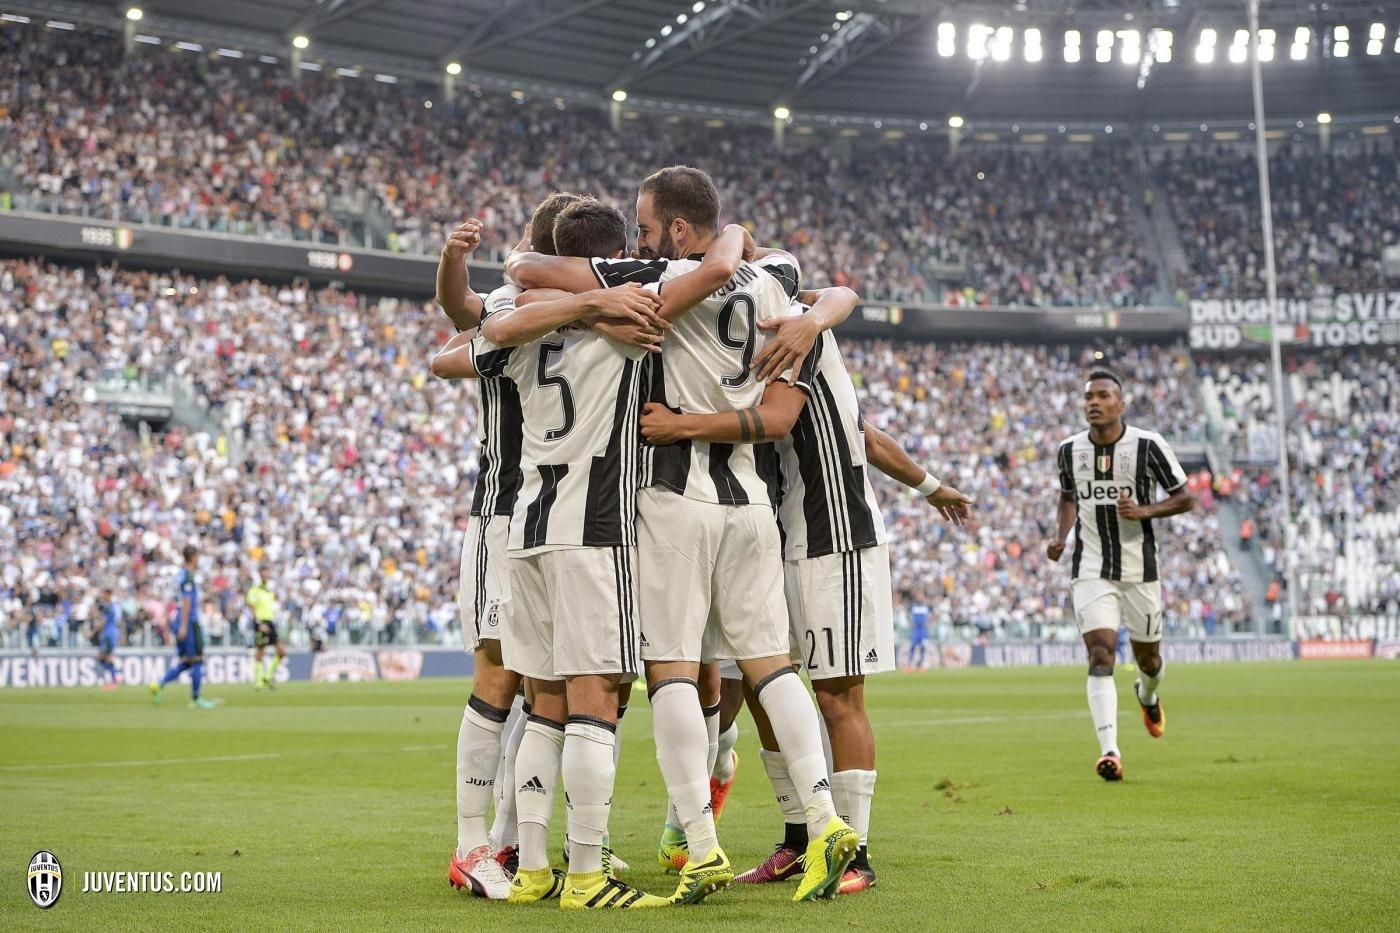 Juventus Dinamo Zagabria streaming live